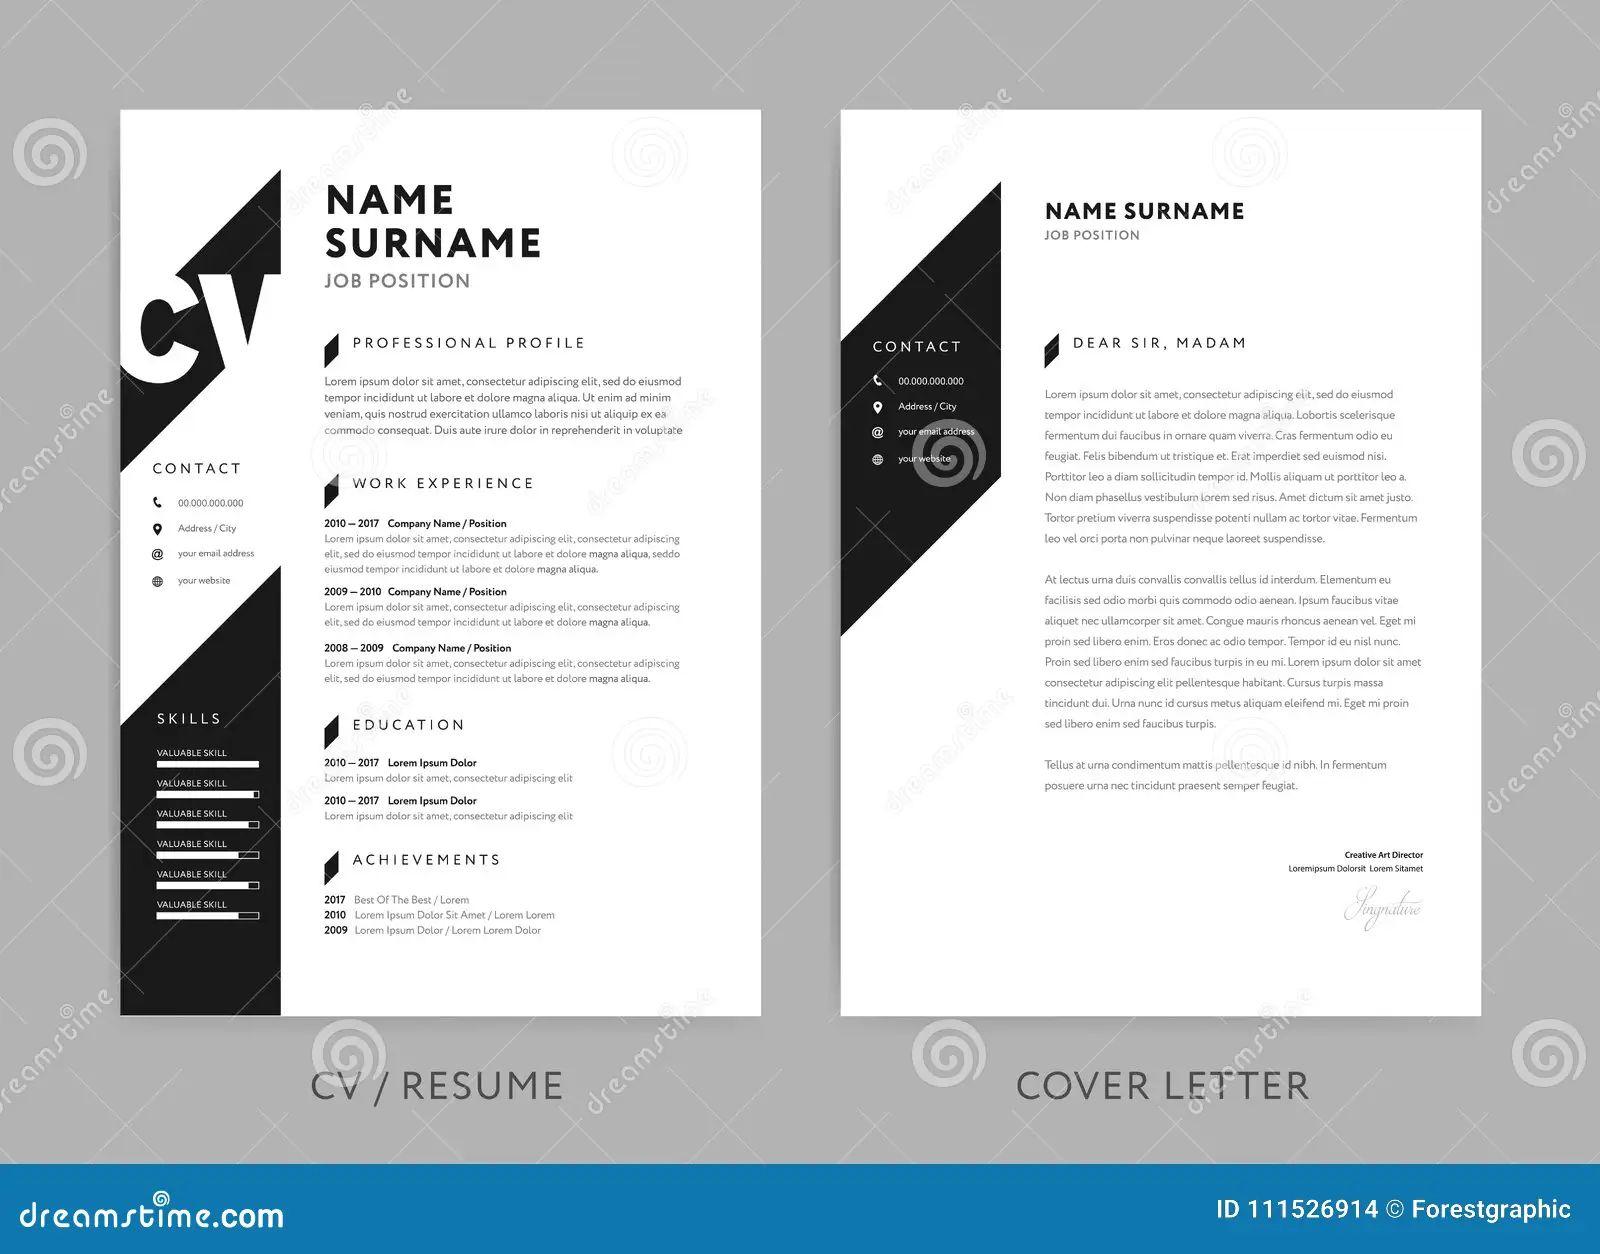 fond design noir et blanc cv